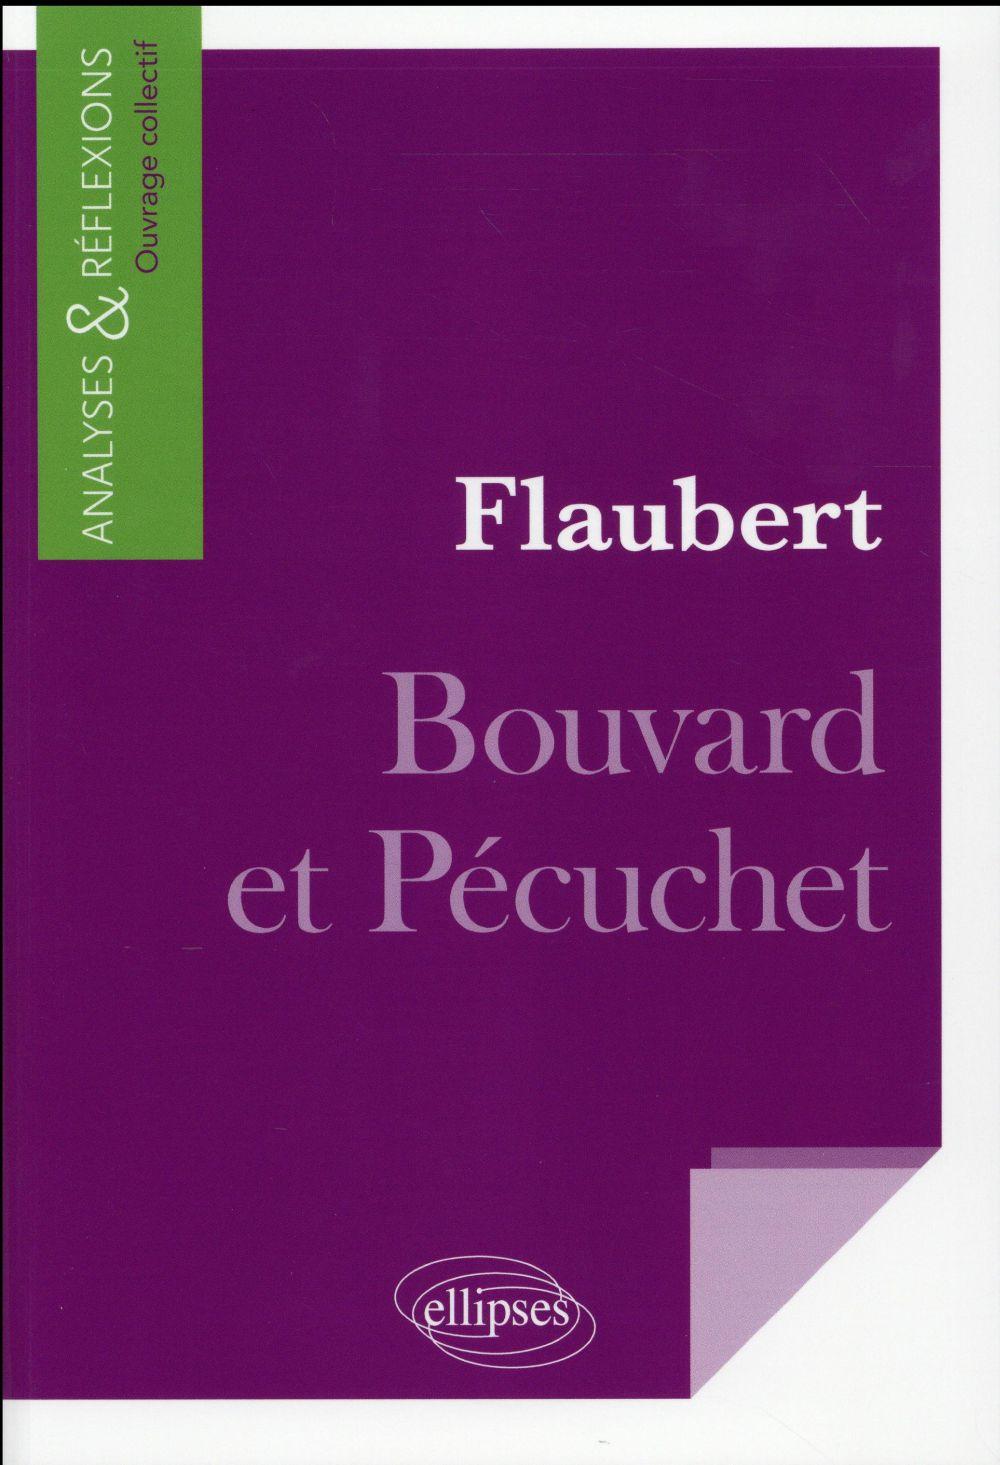 FLAUBERT, BOUVARD ET PECUCHET